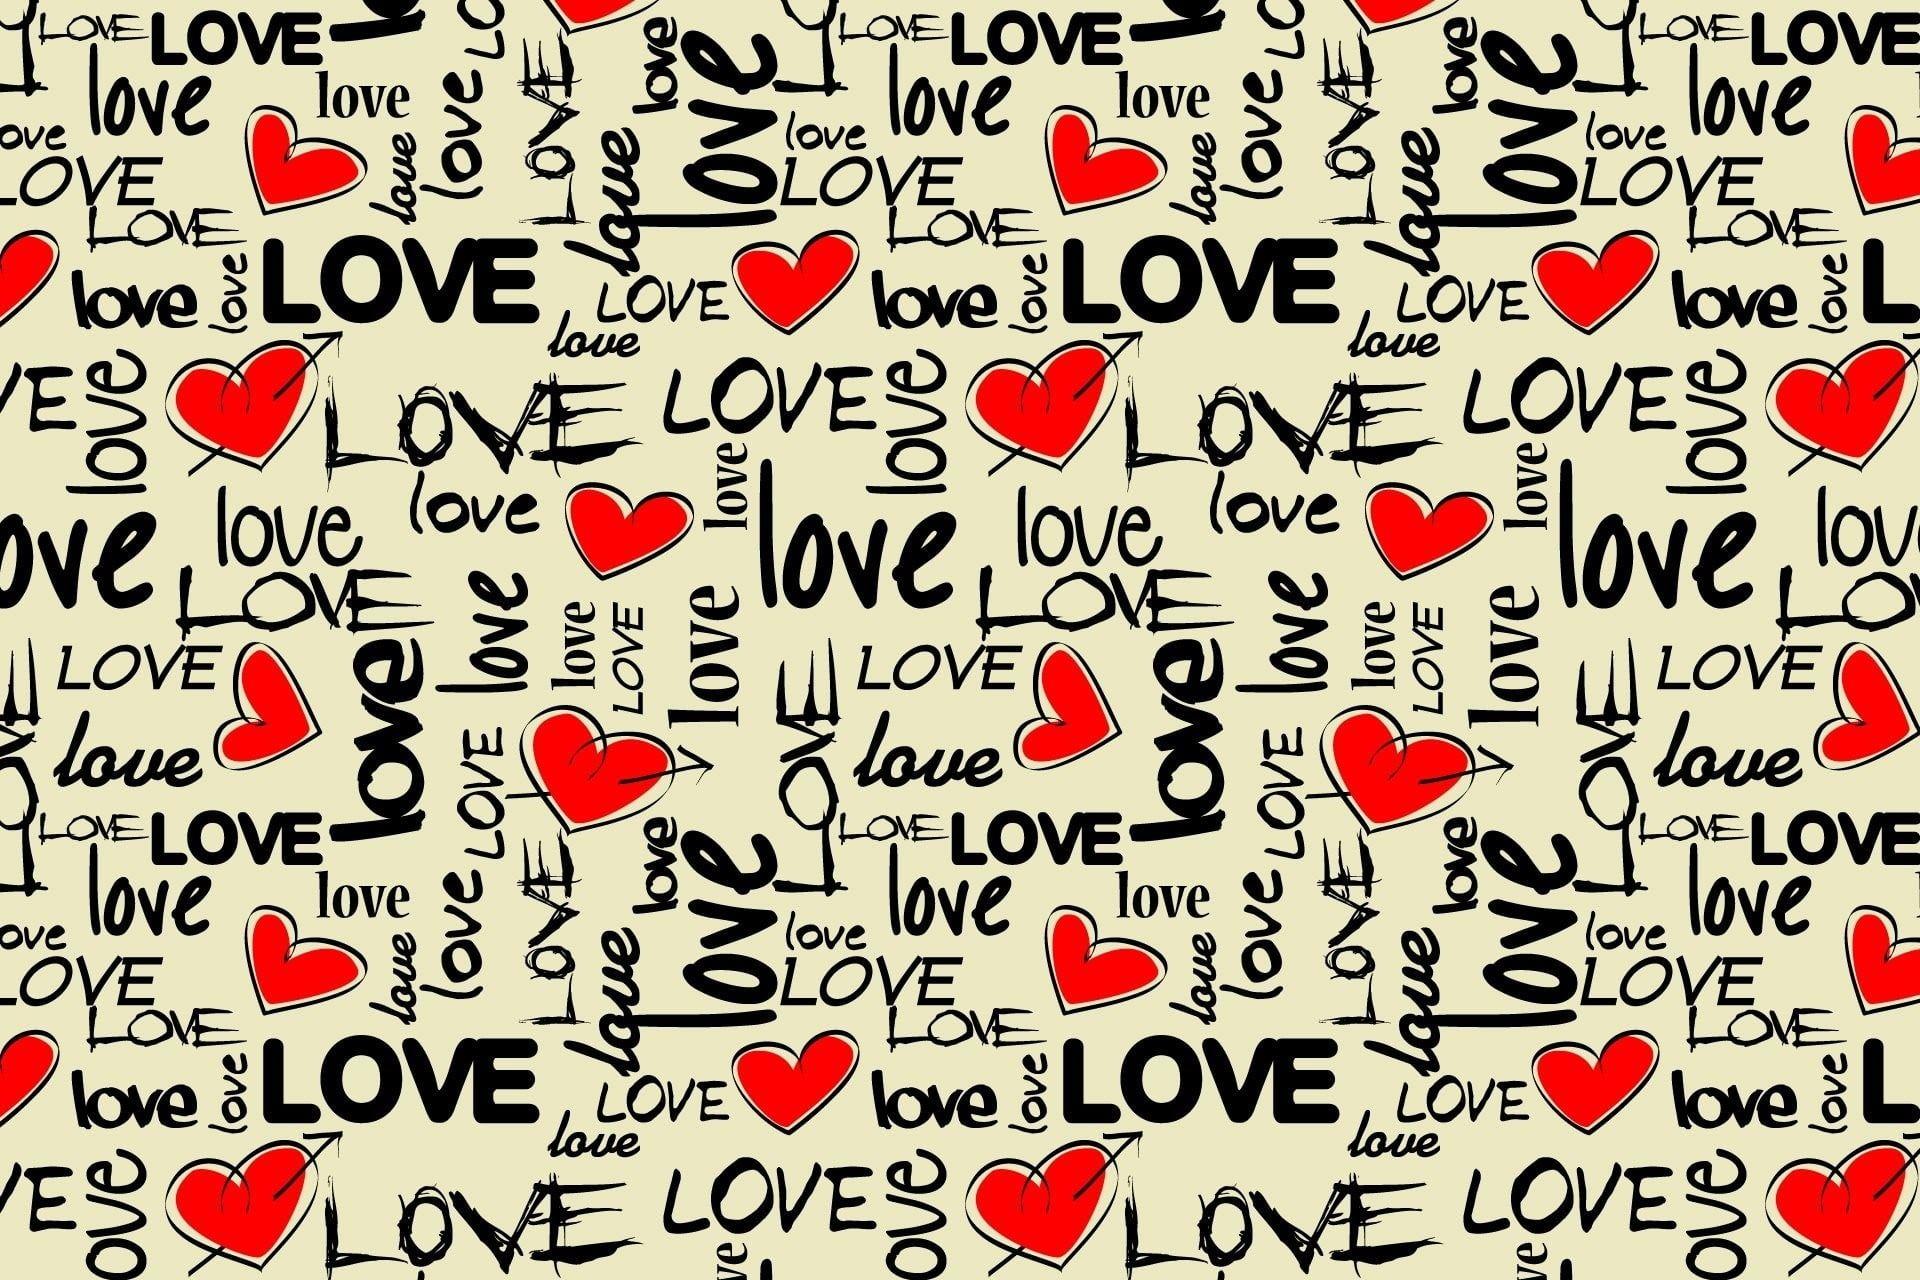 Love Text Illustration Love Art Texture Colorful Heart 1080p Wallpaper Hdwallpaper Desktop Text Illustration Wallpaper Love Picture Letters